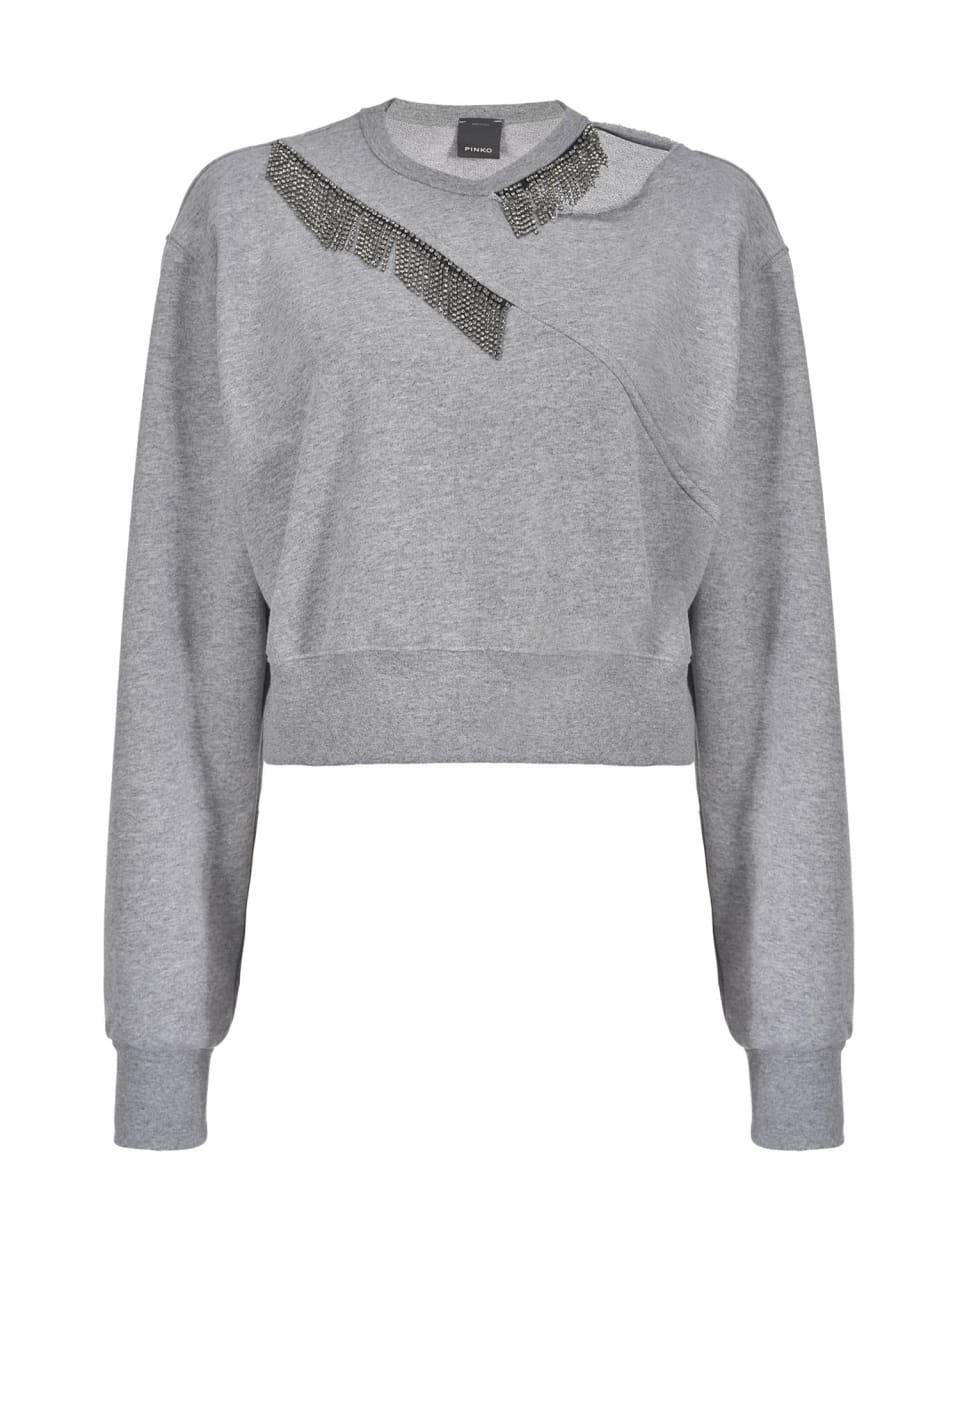 Rhinestone fringe sweatshirt